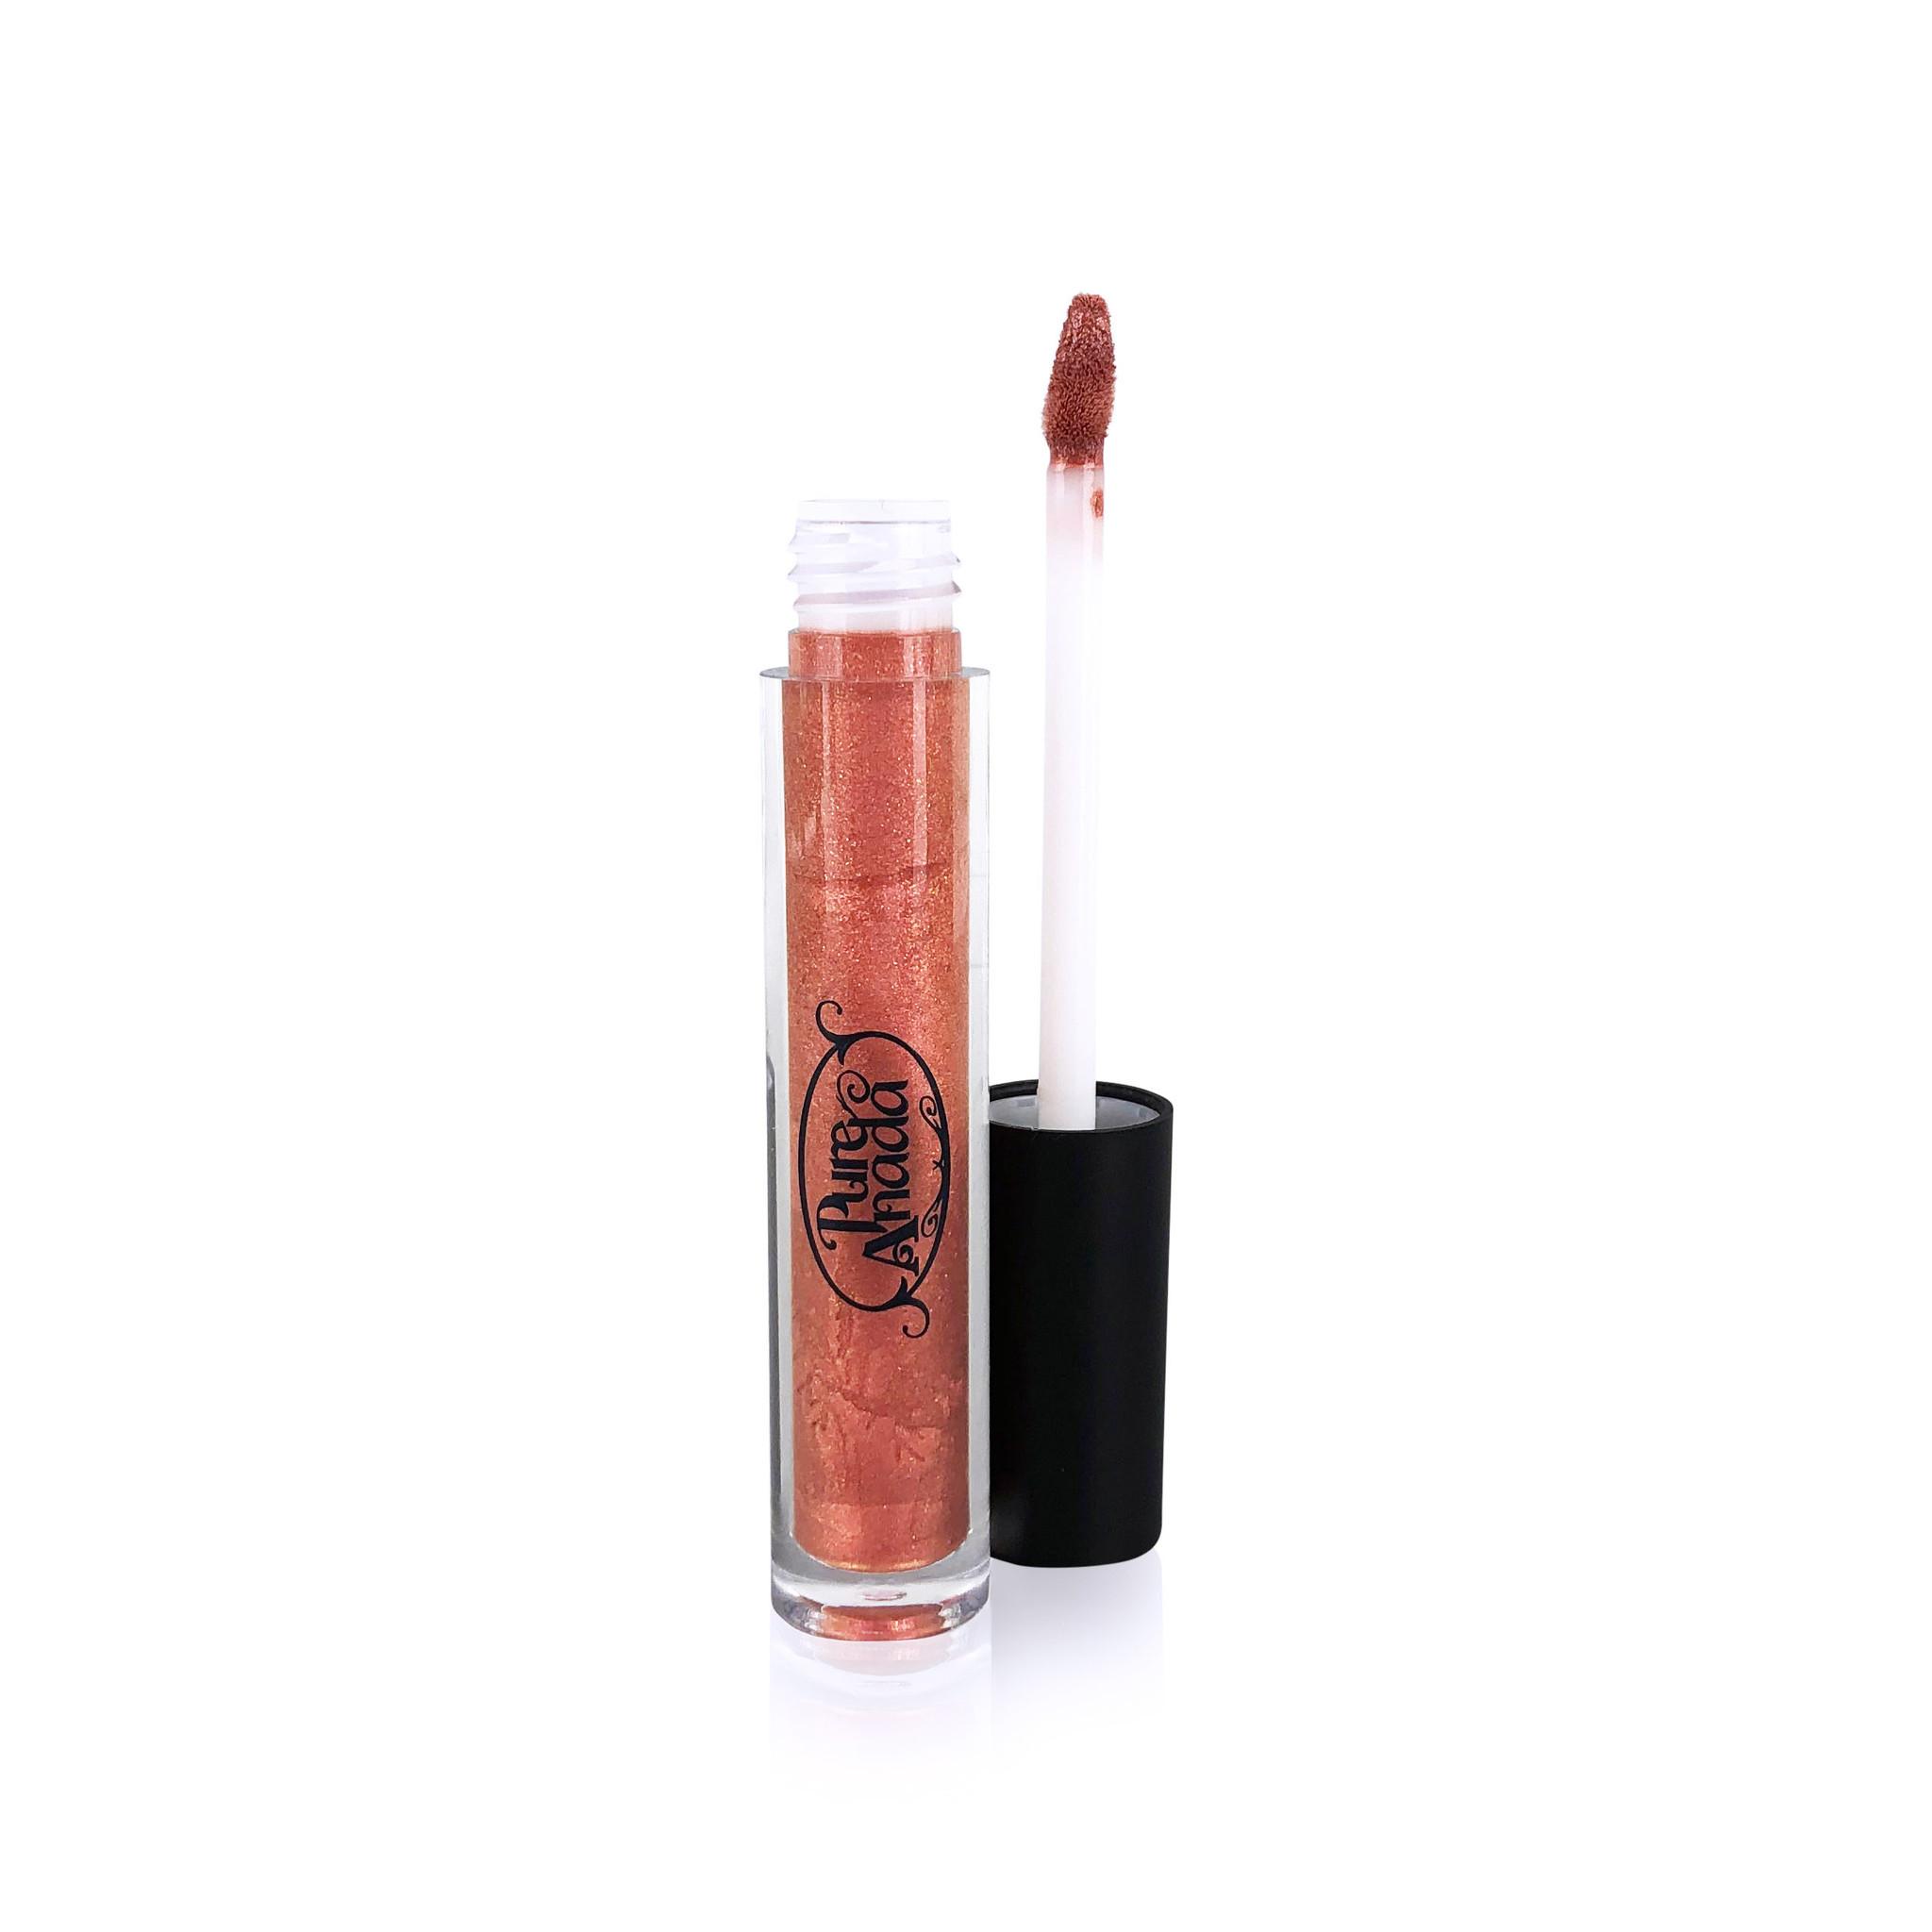 Glisten Mineral Lip Gloss - Rose Gold-2